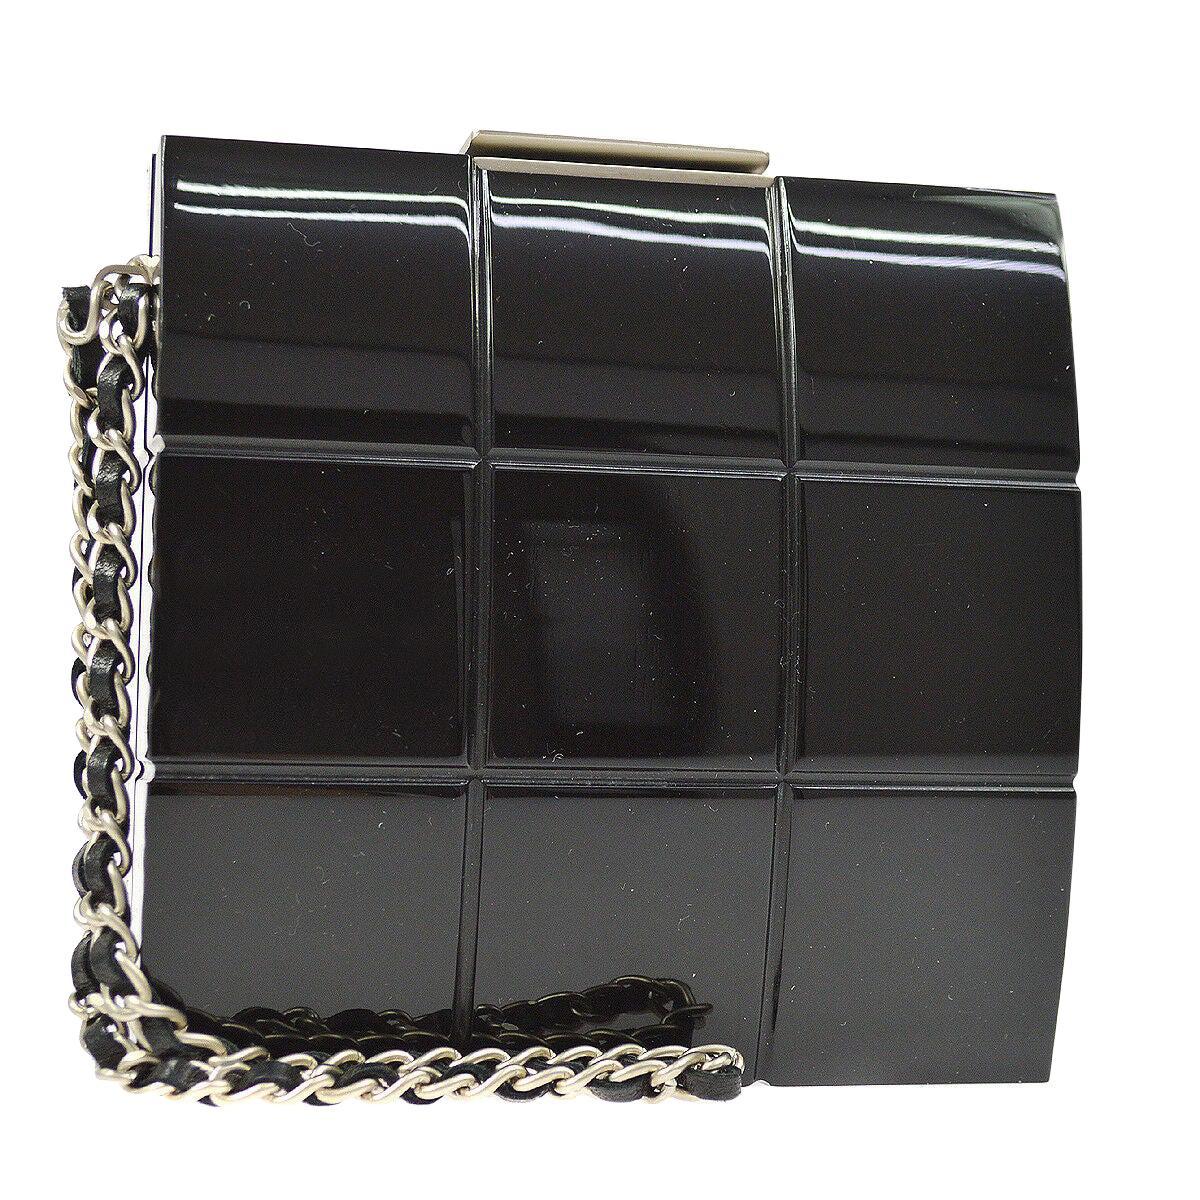 Chanel Runway Black Plastic Silver Chain Evening Clutch Bag